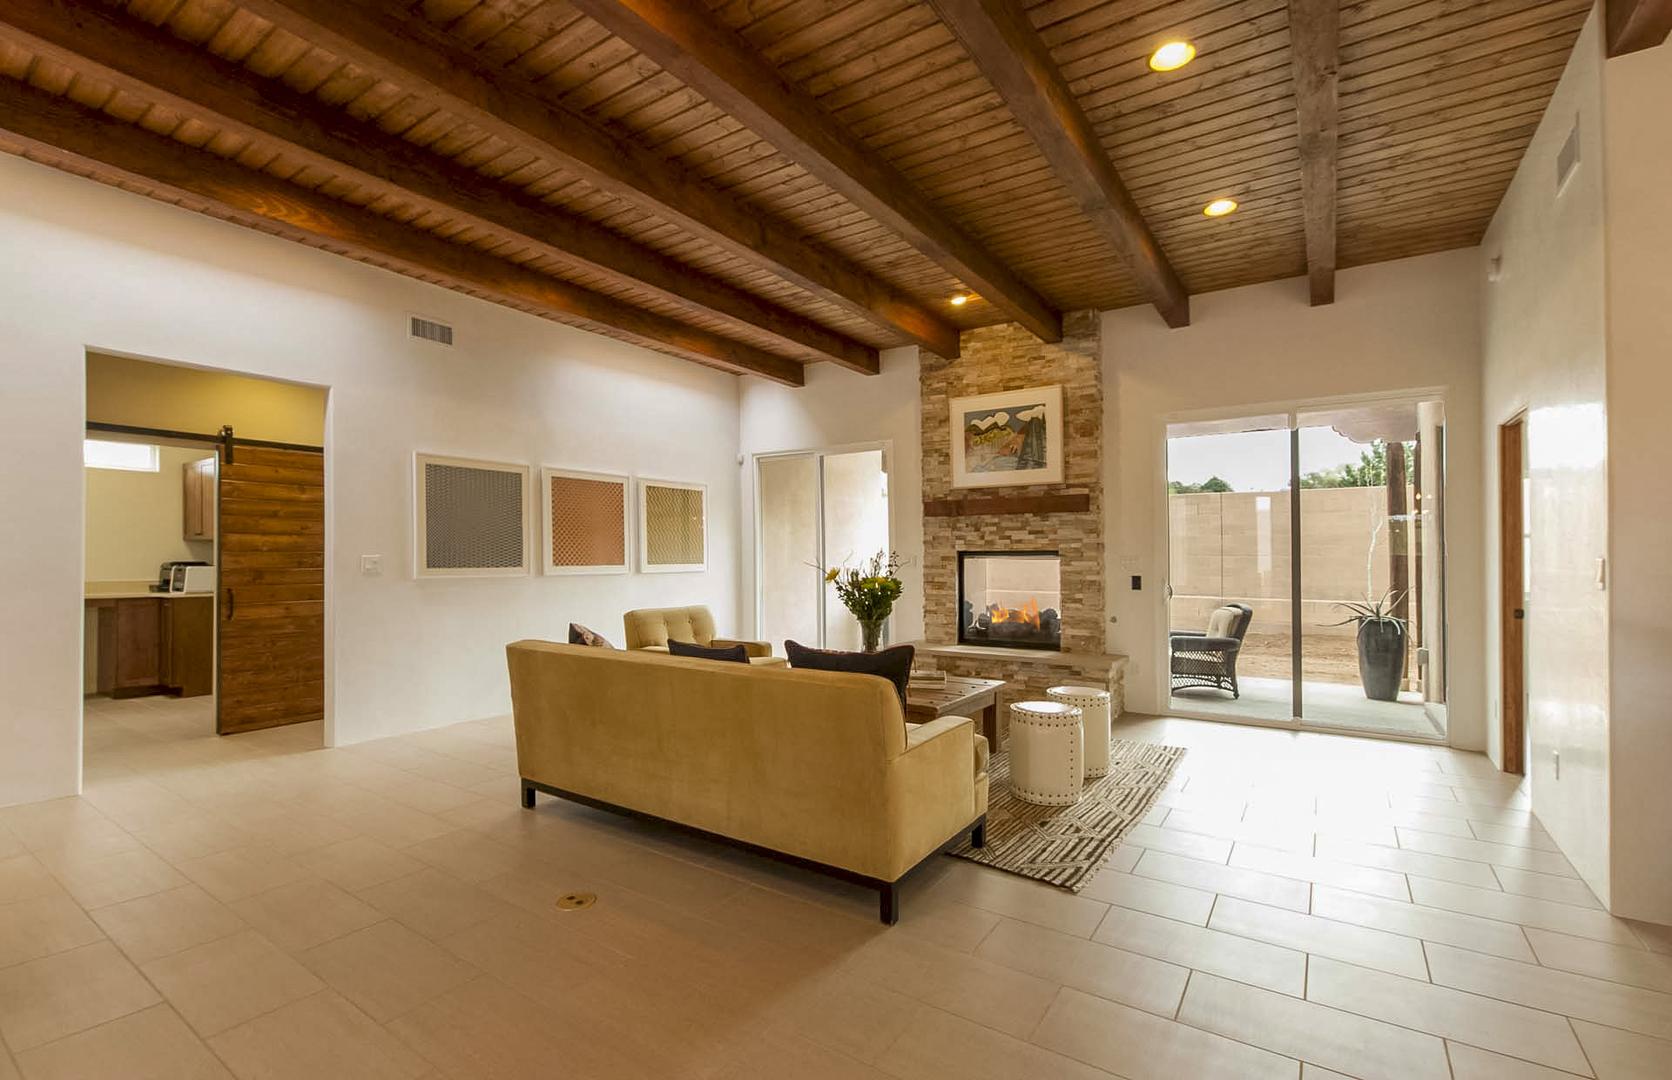 New Construction Homes, Houses - Plaza Bonita Santa Fe Subdivision ...